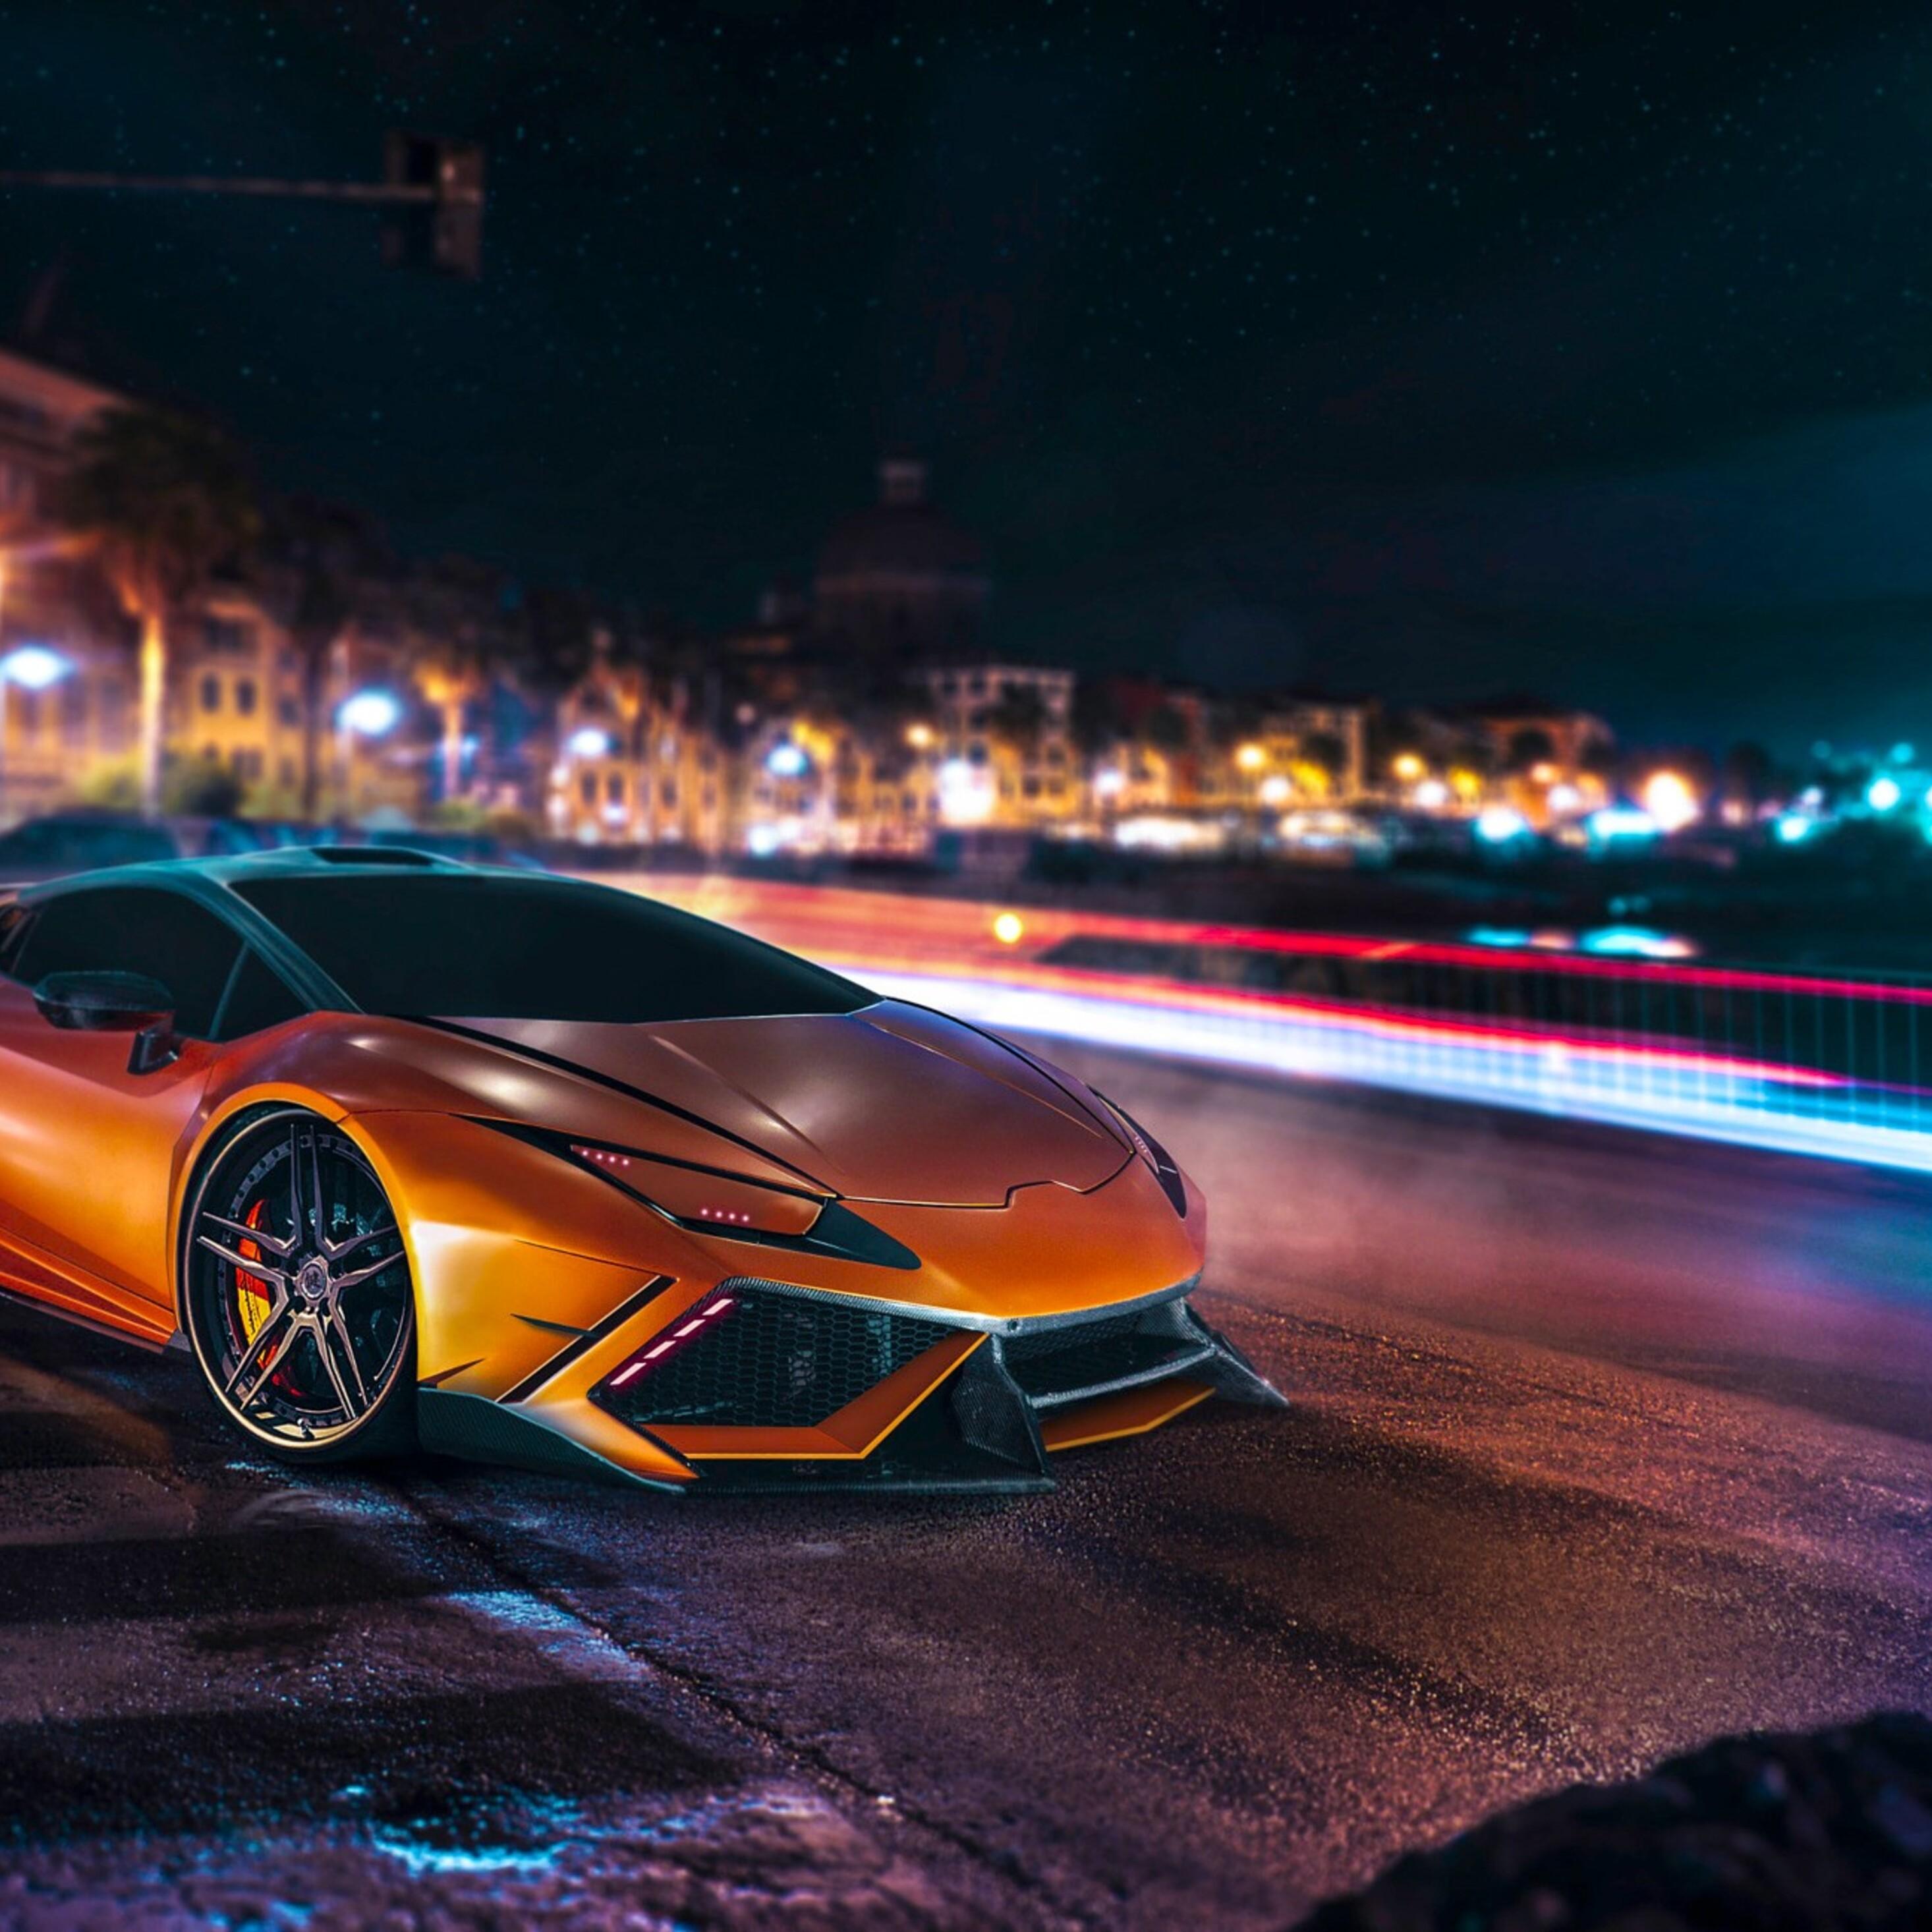 2932x2932 Lamborghini Huracan Full HD Ipad Pro Retina